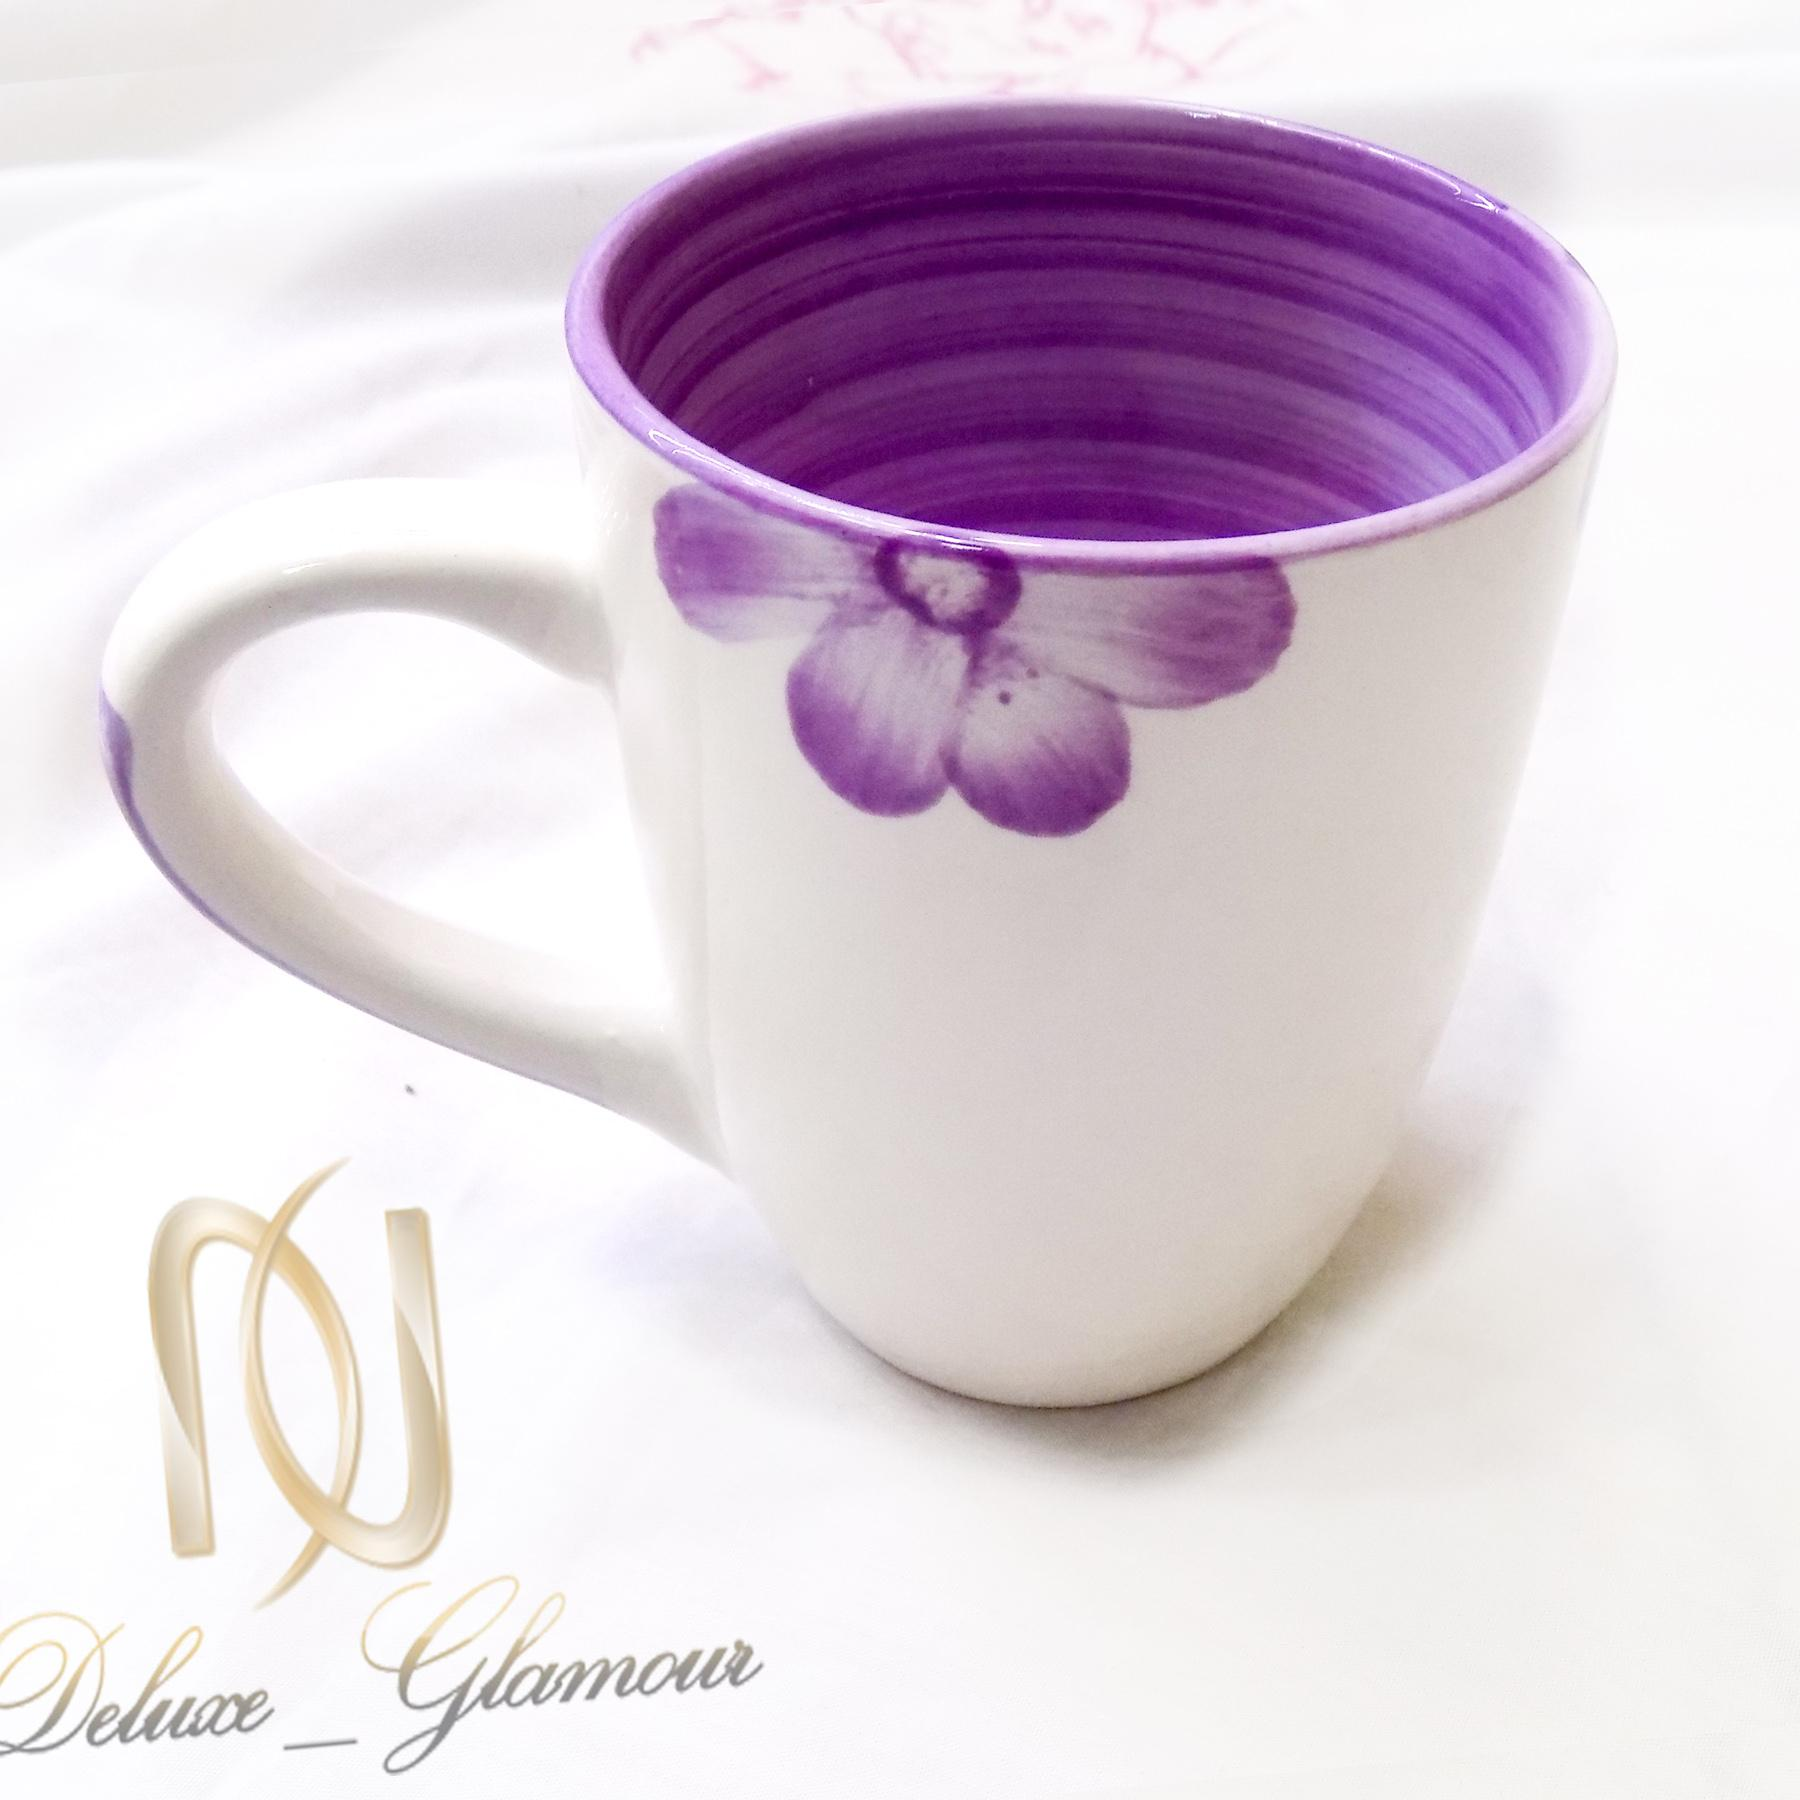 ليوان سراميكي طرح گل ka-n113 از نماي ليوان بنفش